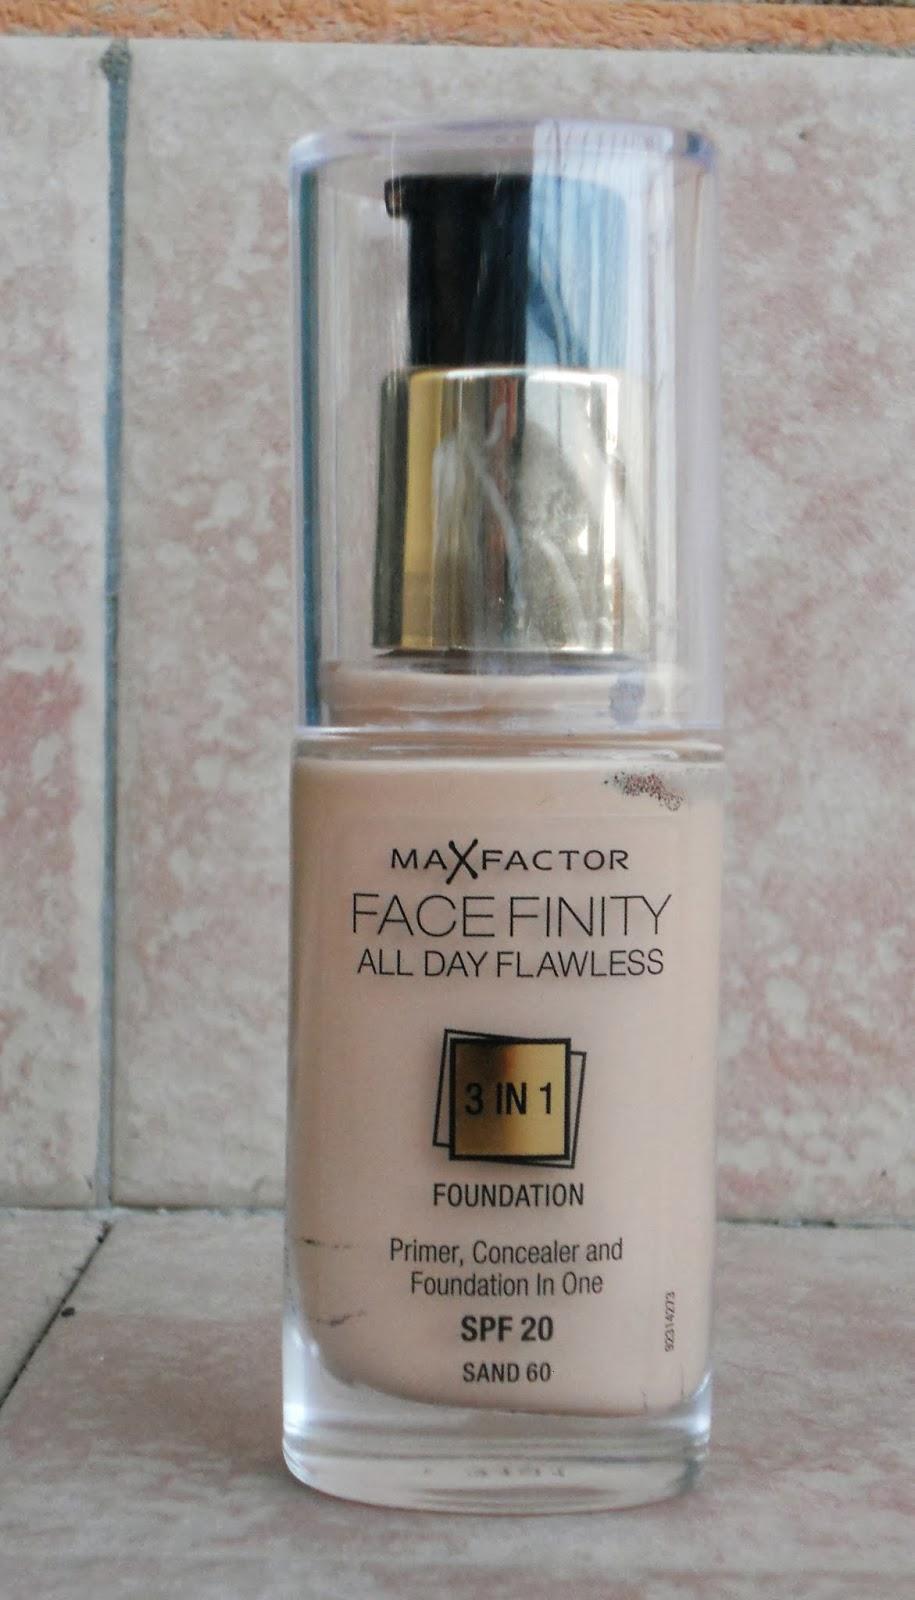 max factor fondotinta facefinity 3 in 1